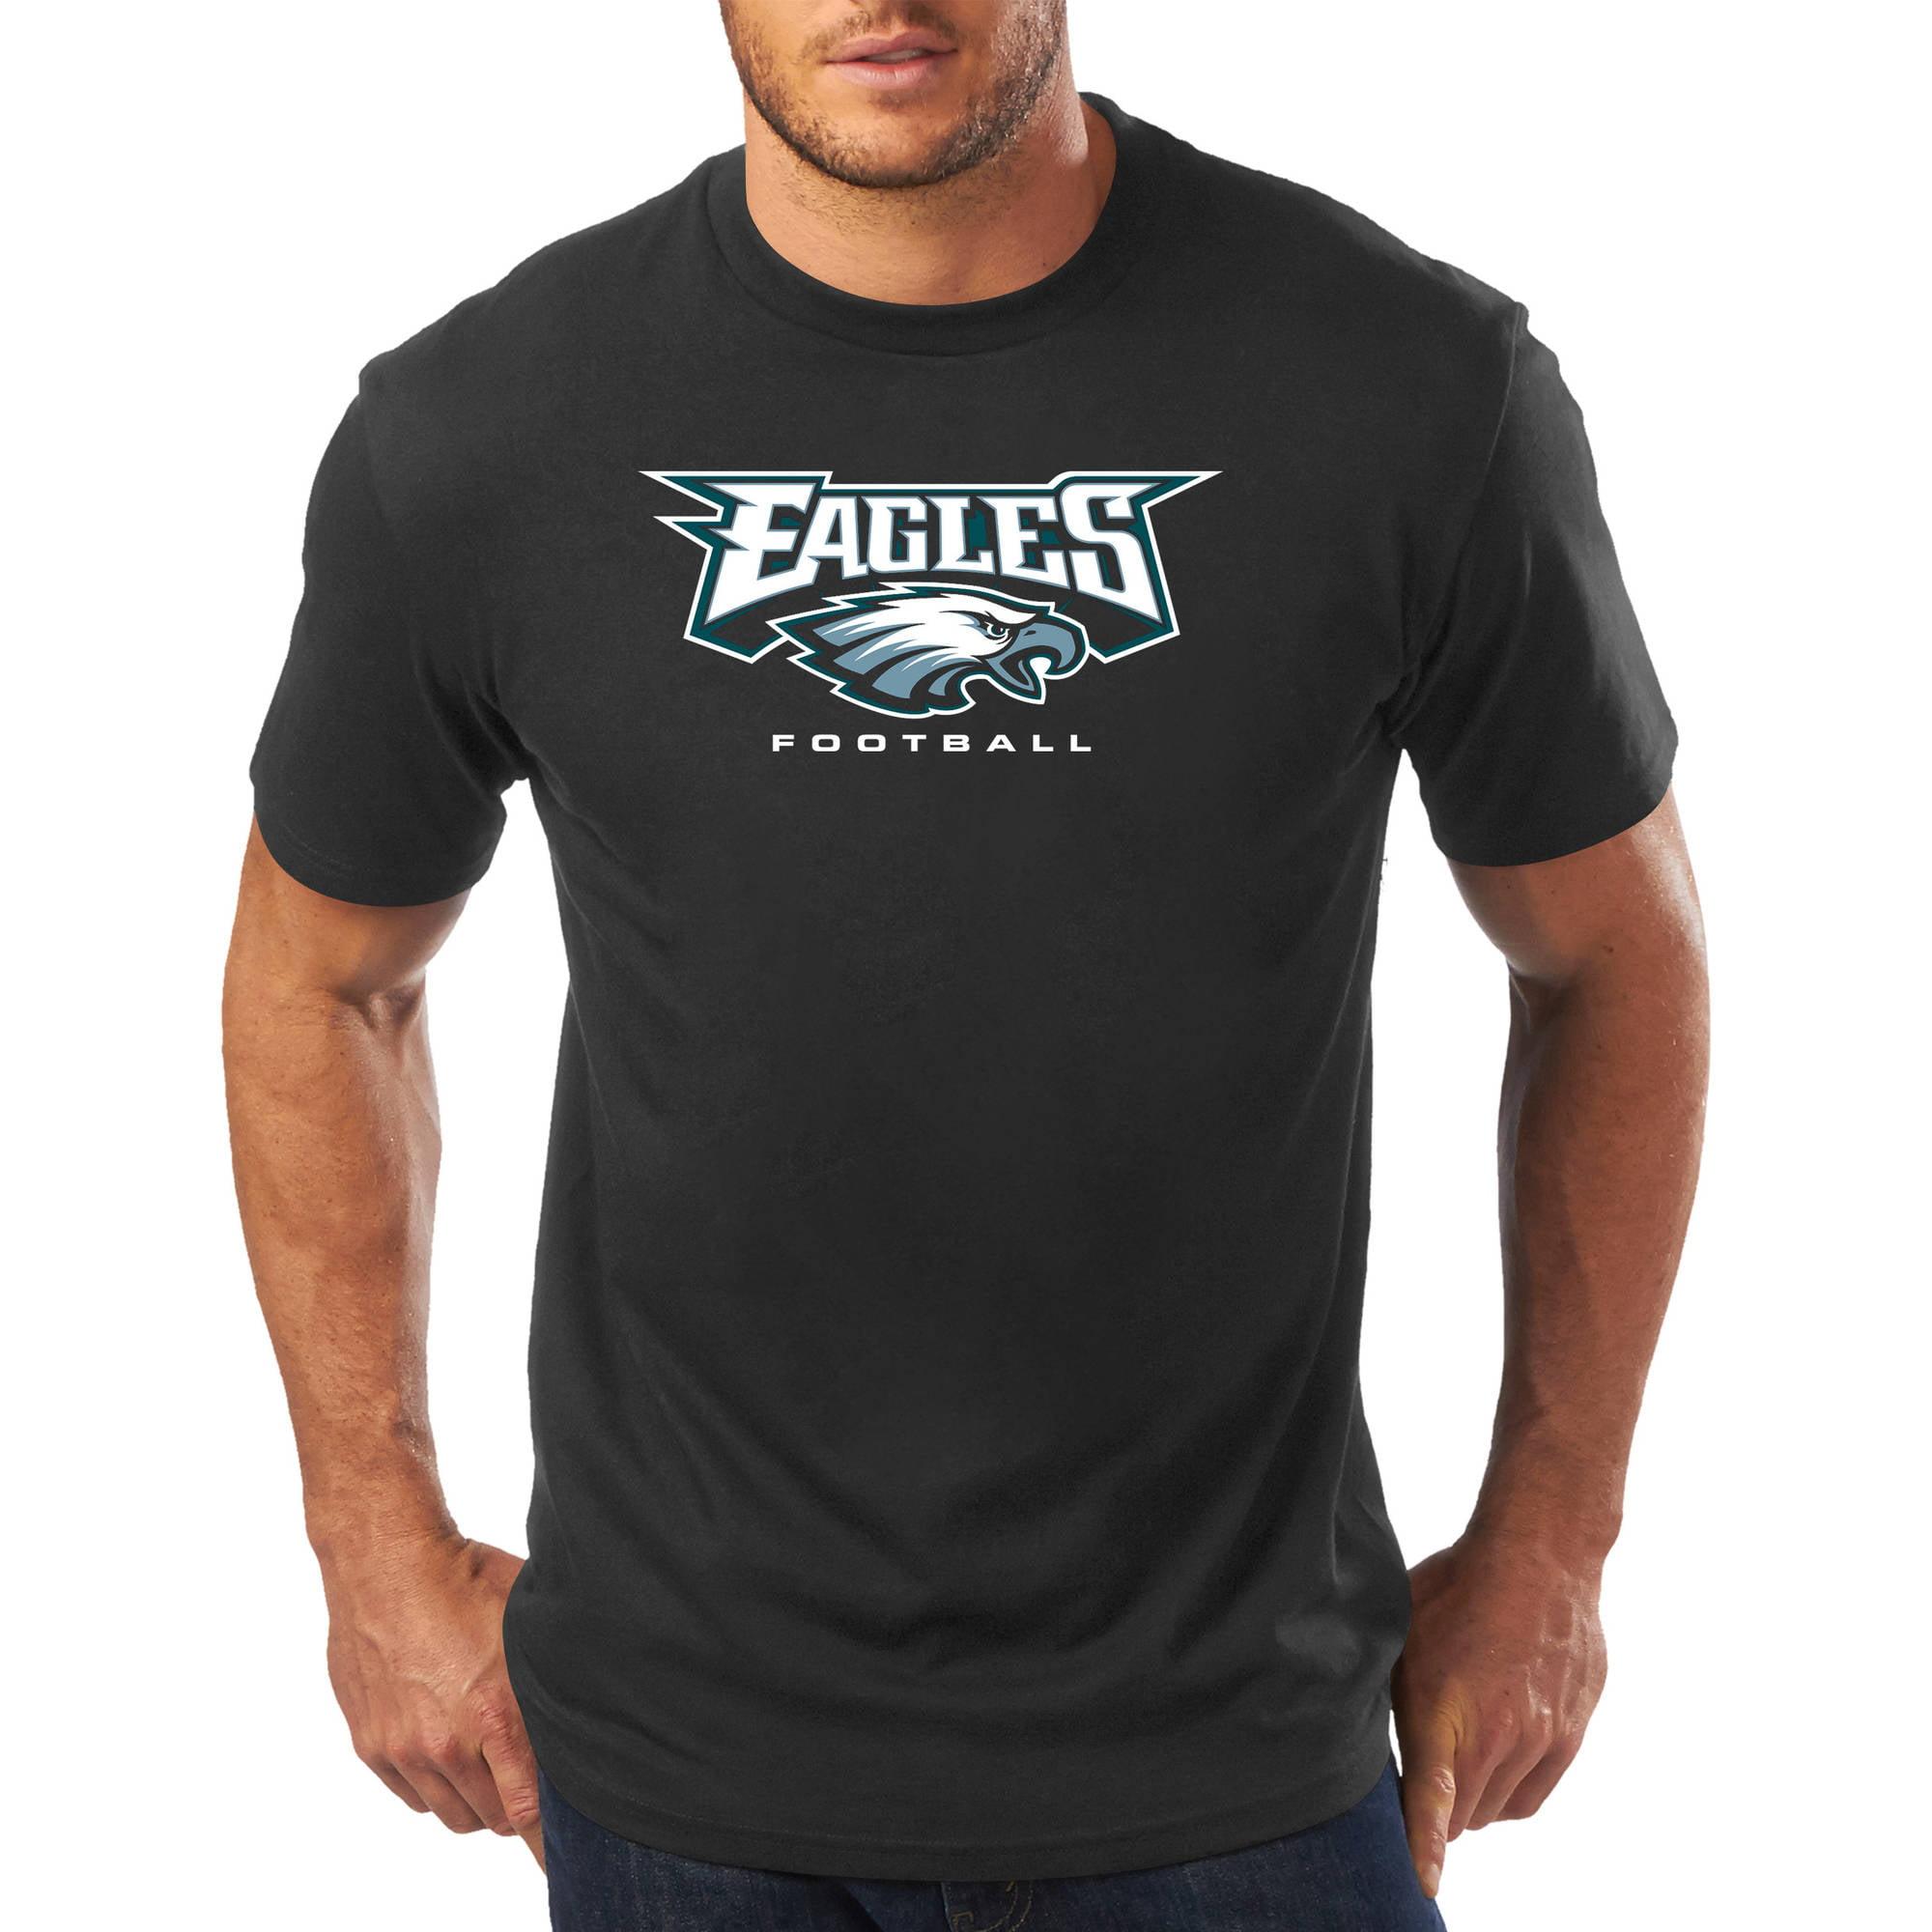 Big Men's NFL Philadelphia Eagles Short Sleeve Tee